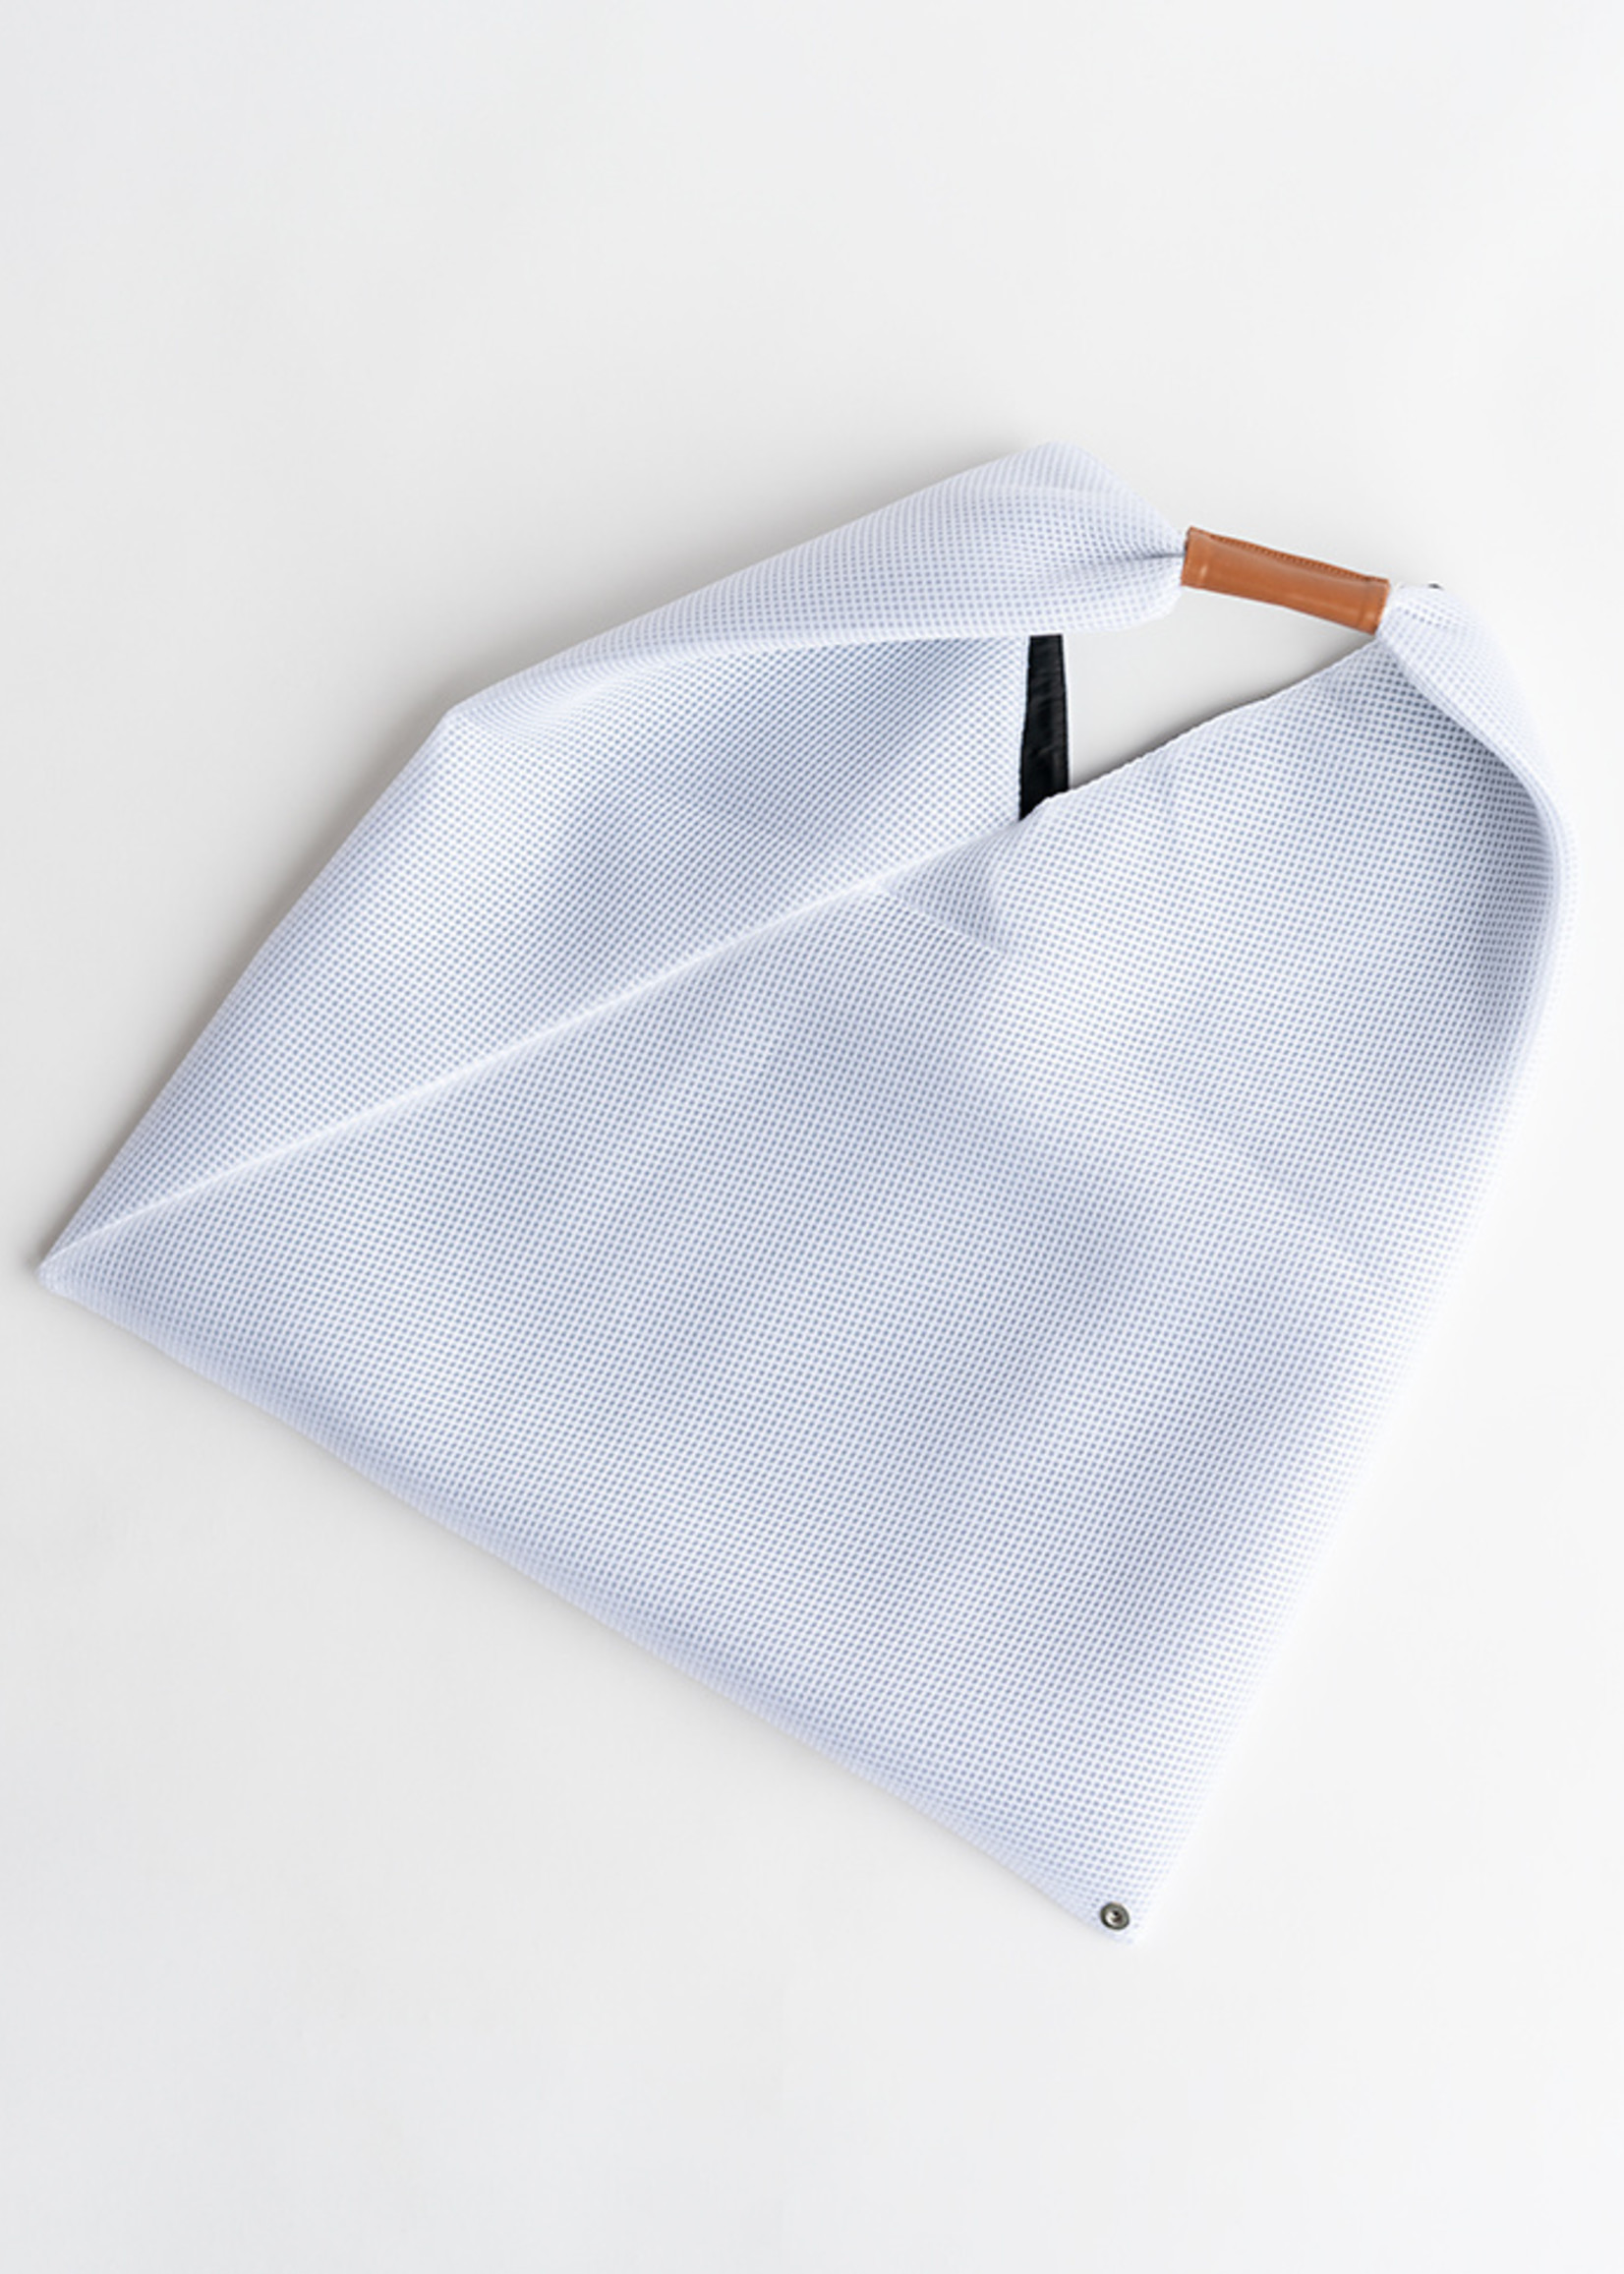 MM6 MAISON MARGIELA Medium Japanese Tote White Mesh